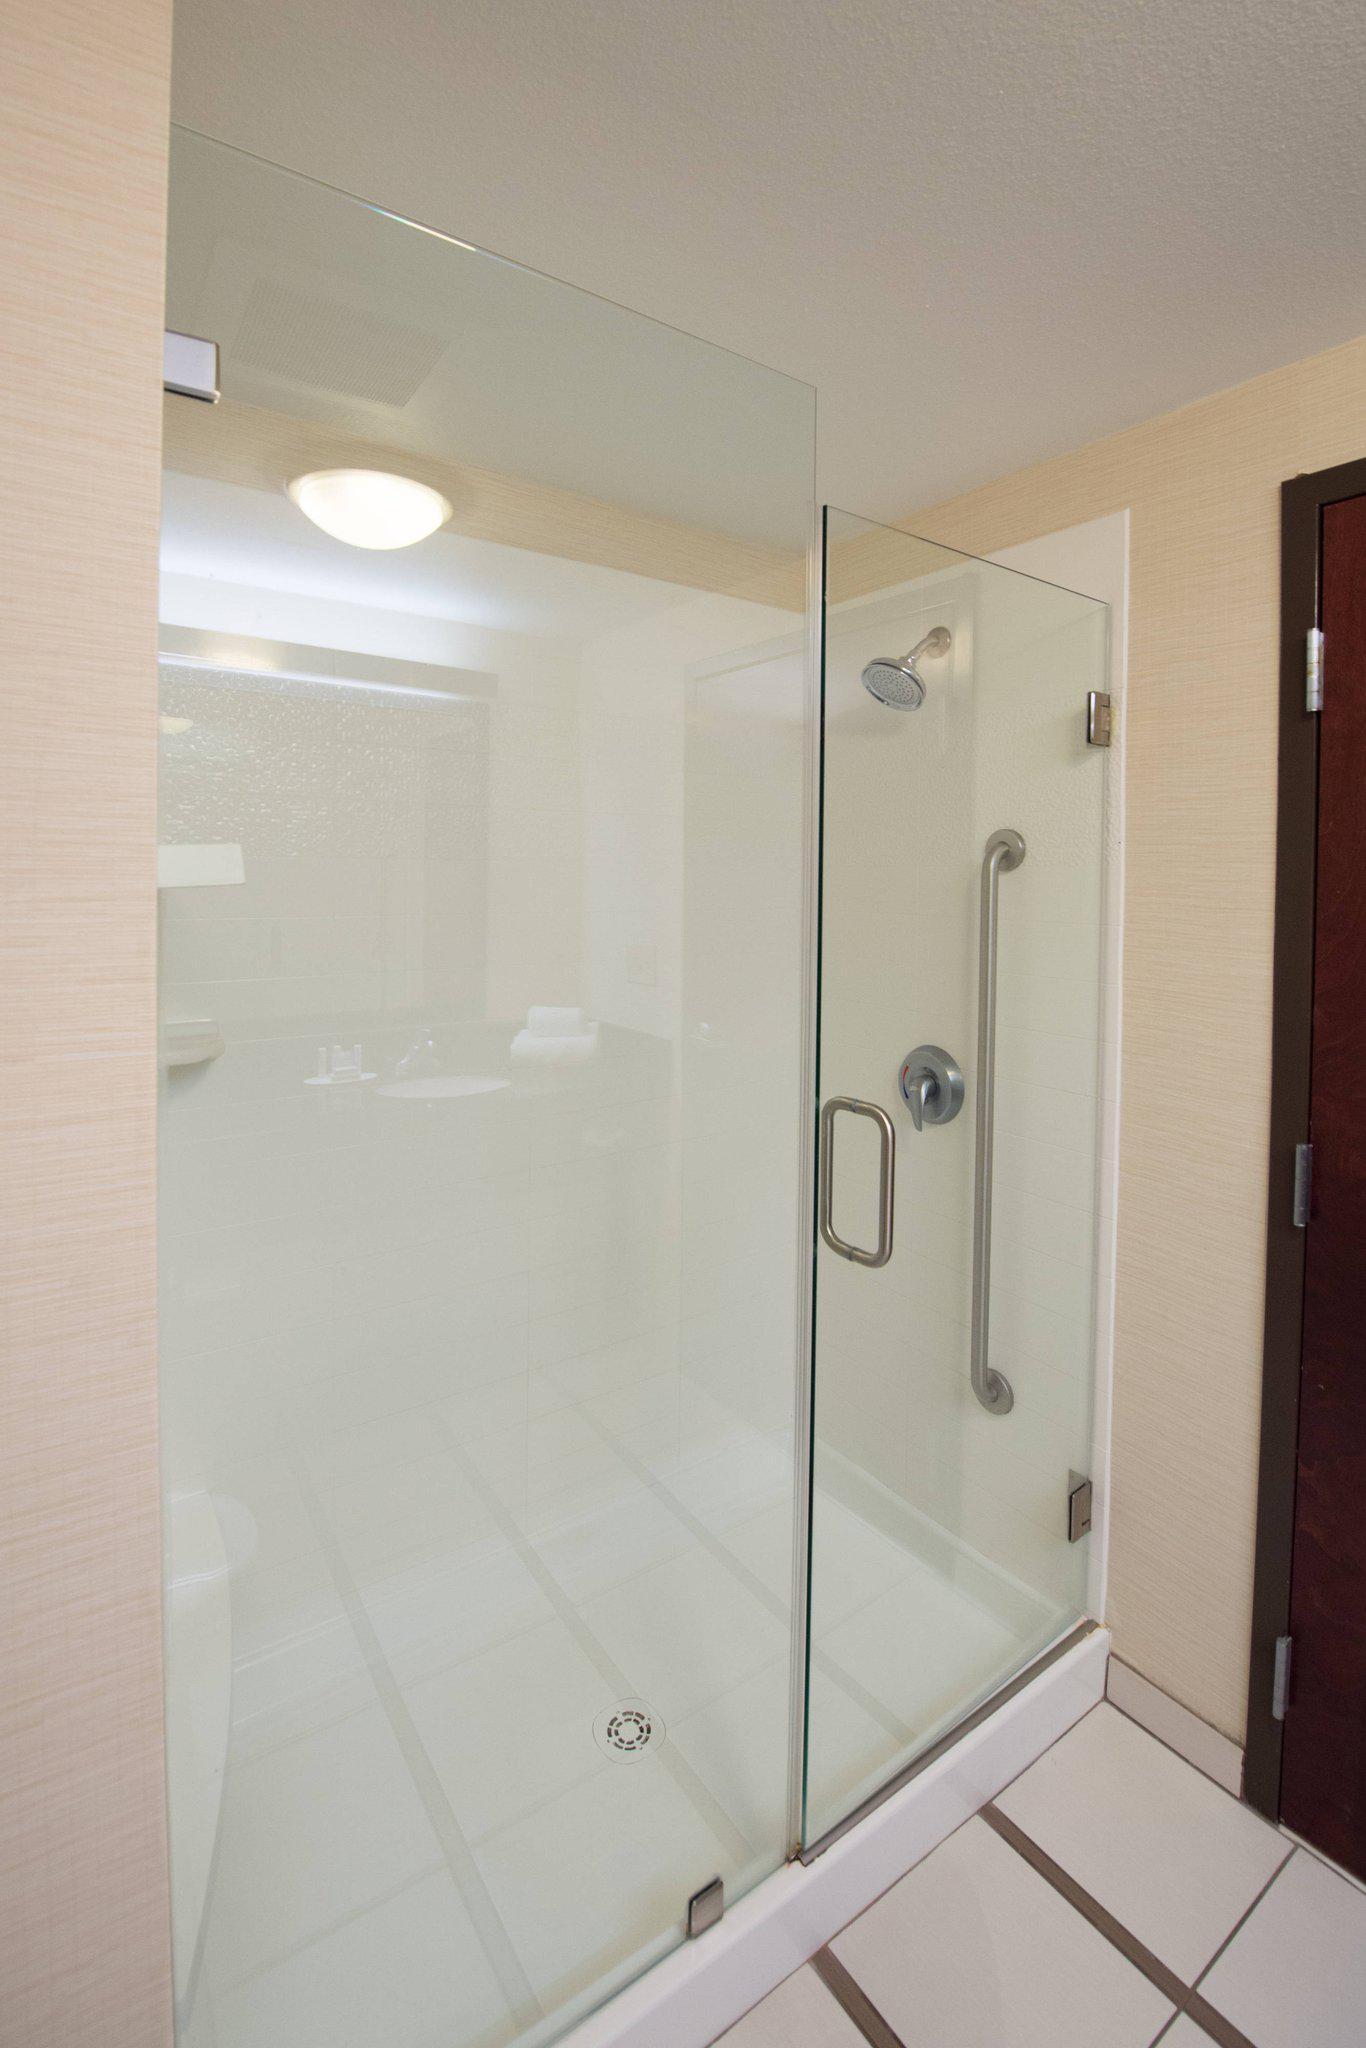 Fairfield Inn & Suites by Marriott Charleston North/Ashley Phosphate